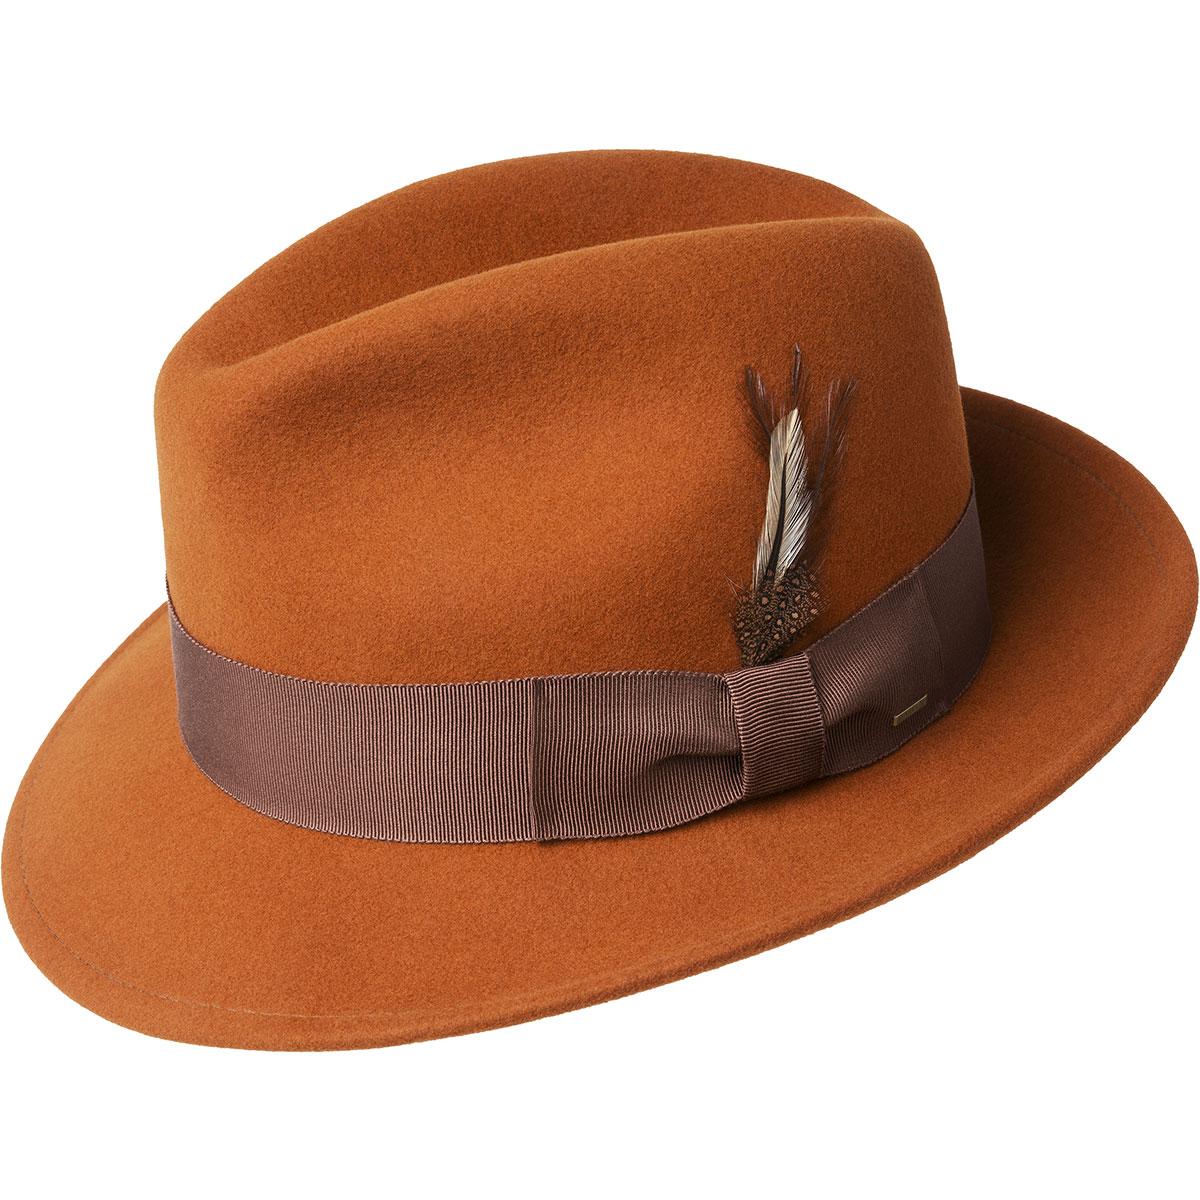 Men's Vintage Style Hats, Retro Hats Blixen Limited Edition Fedora $98.00 AT vintagedancer.com